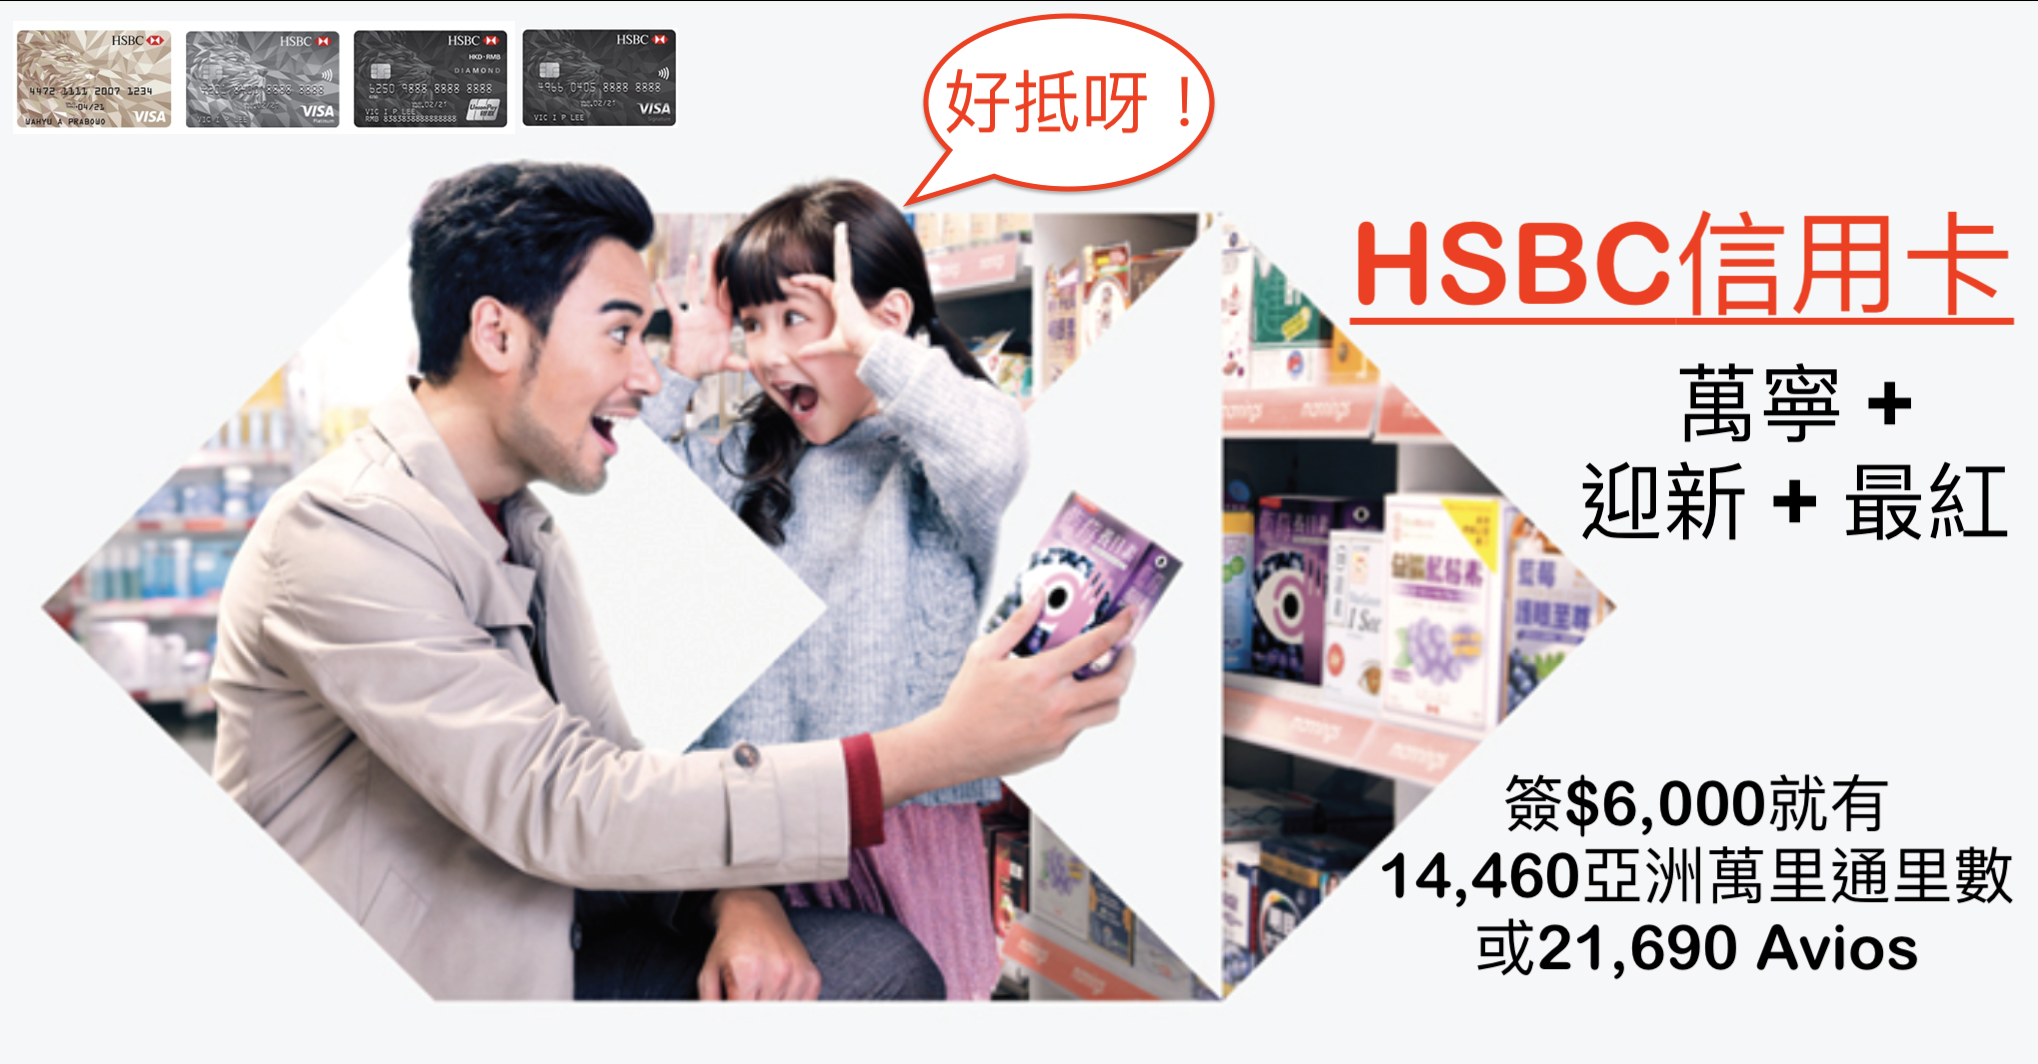 HSBC 信用卡萬寧優惠 + 迎新 + 最紅自主獎賞!簽$6,000就有14,460亞洲萬里通里數或21,690 Avios!夠換程日本來回機票啦!